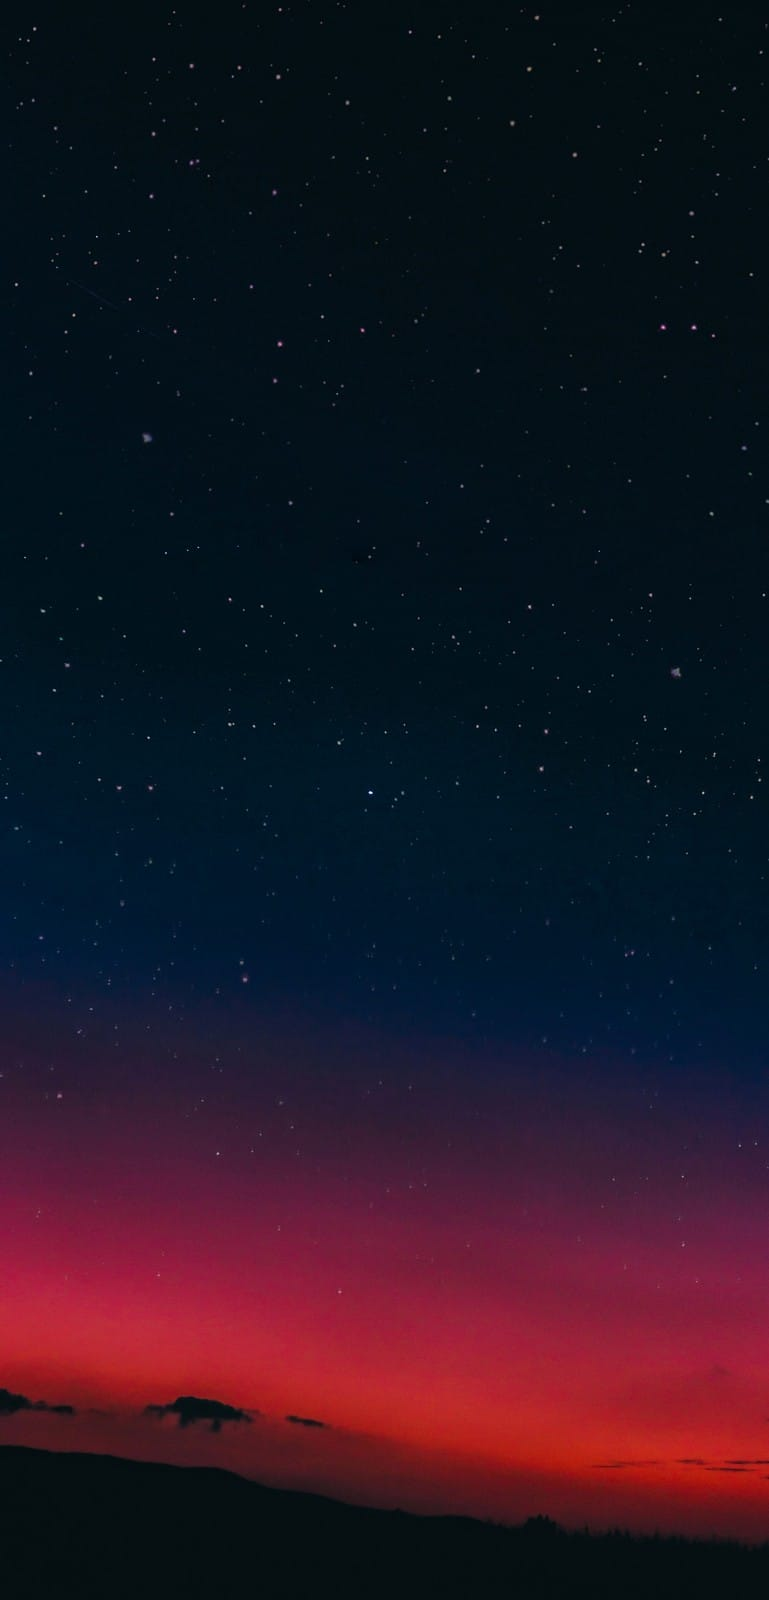 Xiaomi Poco F1 wallpaper 4